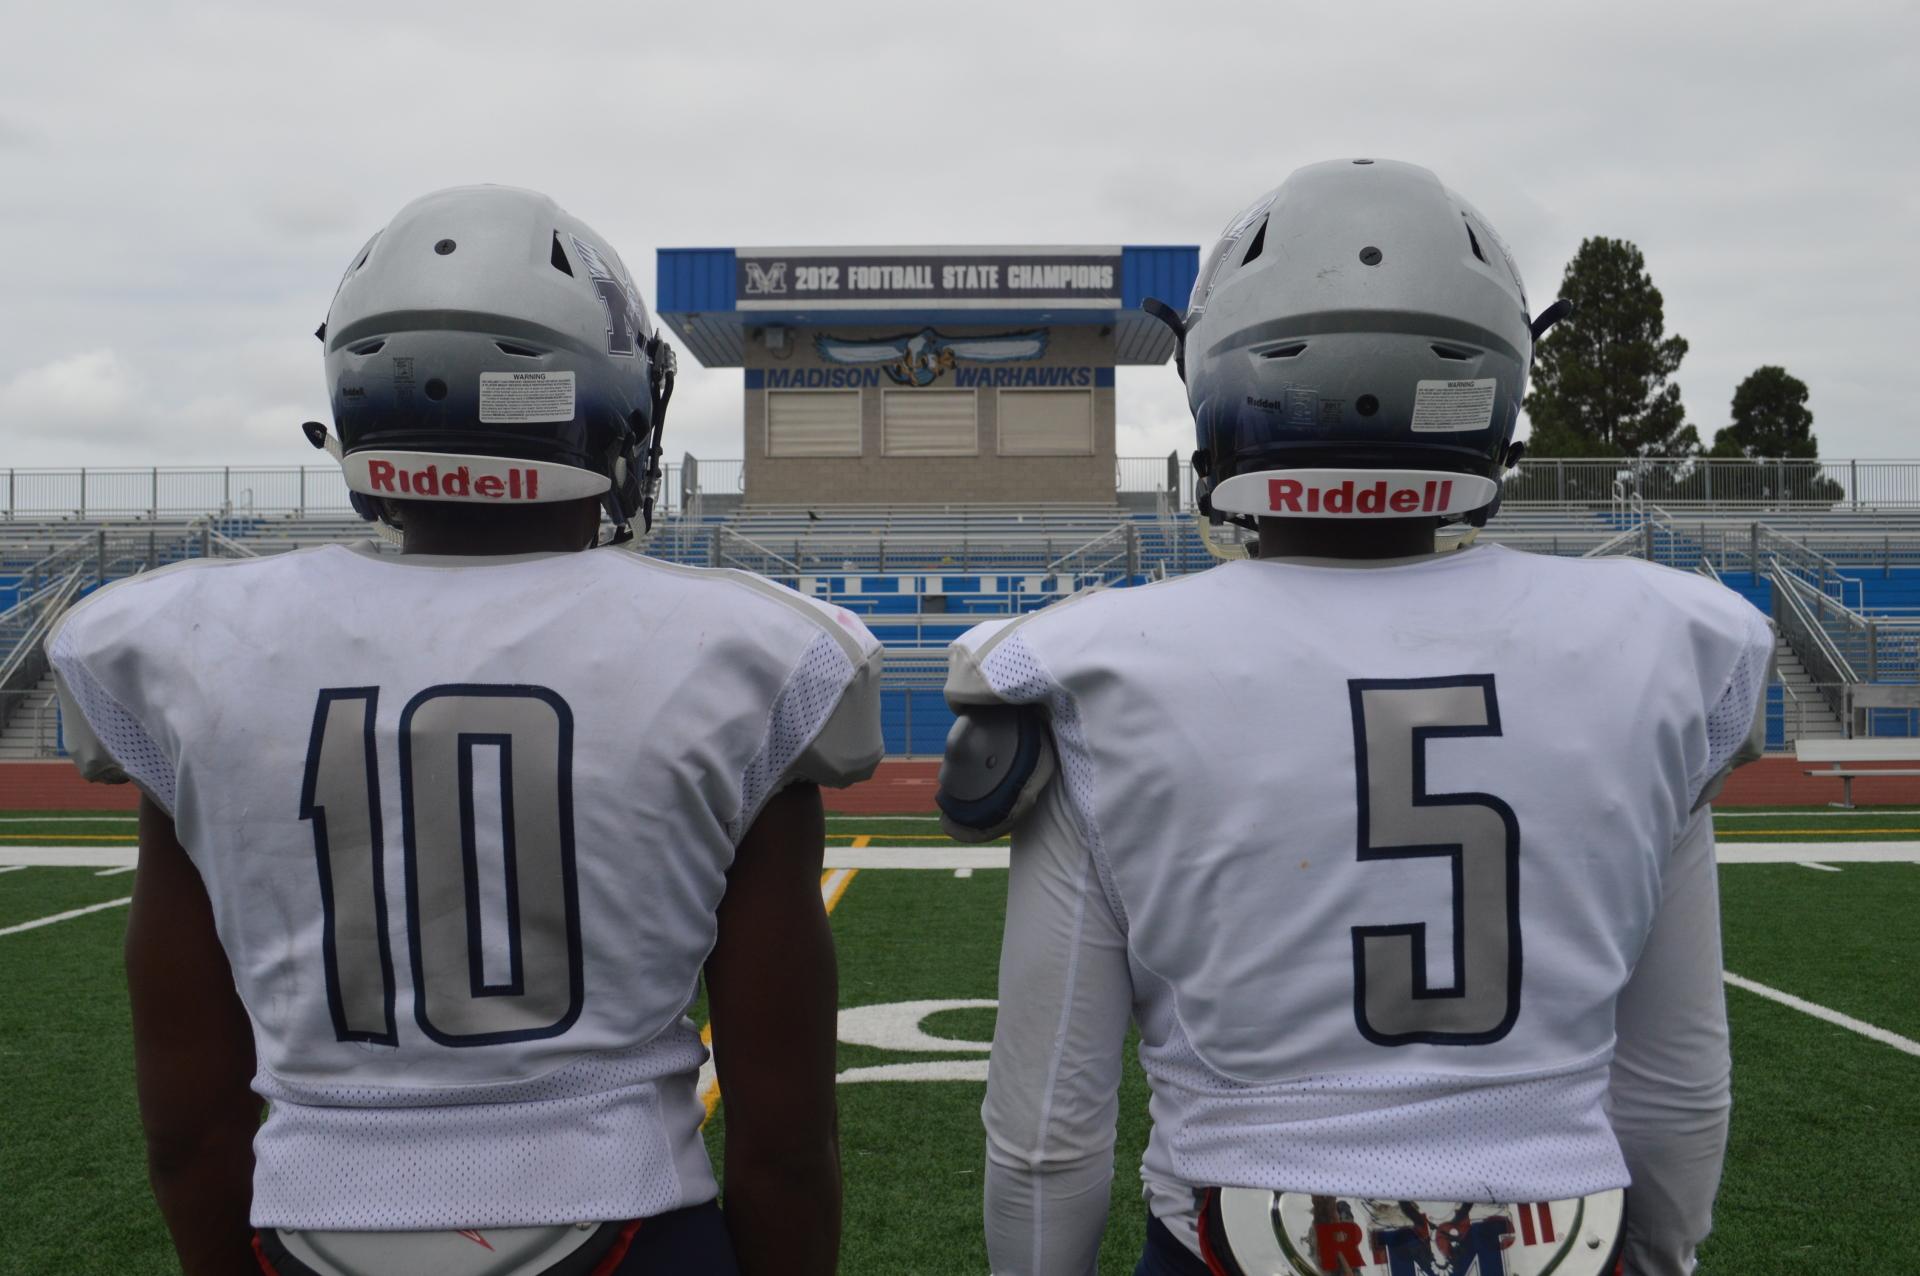 Madison High School - Athlete Daniel Stokes